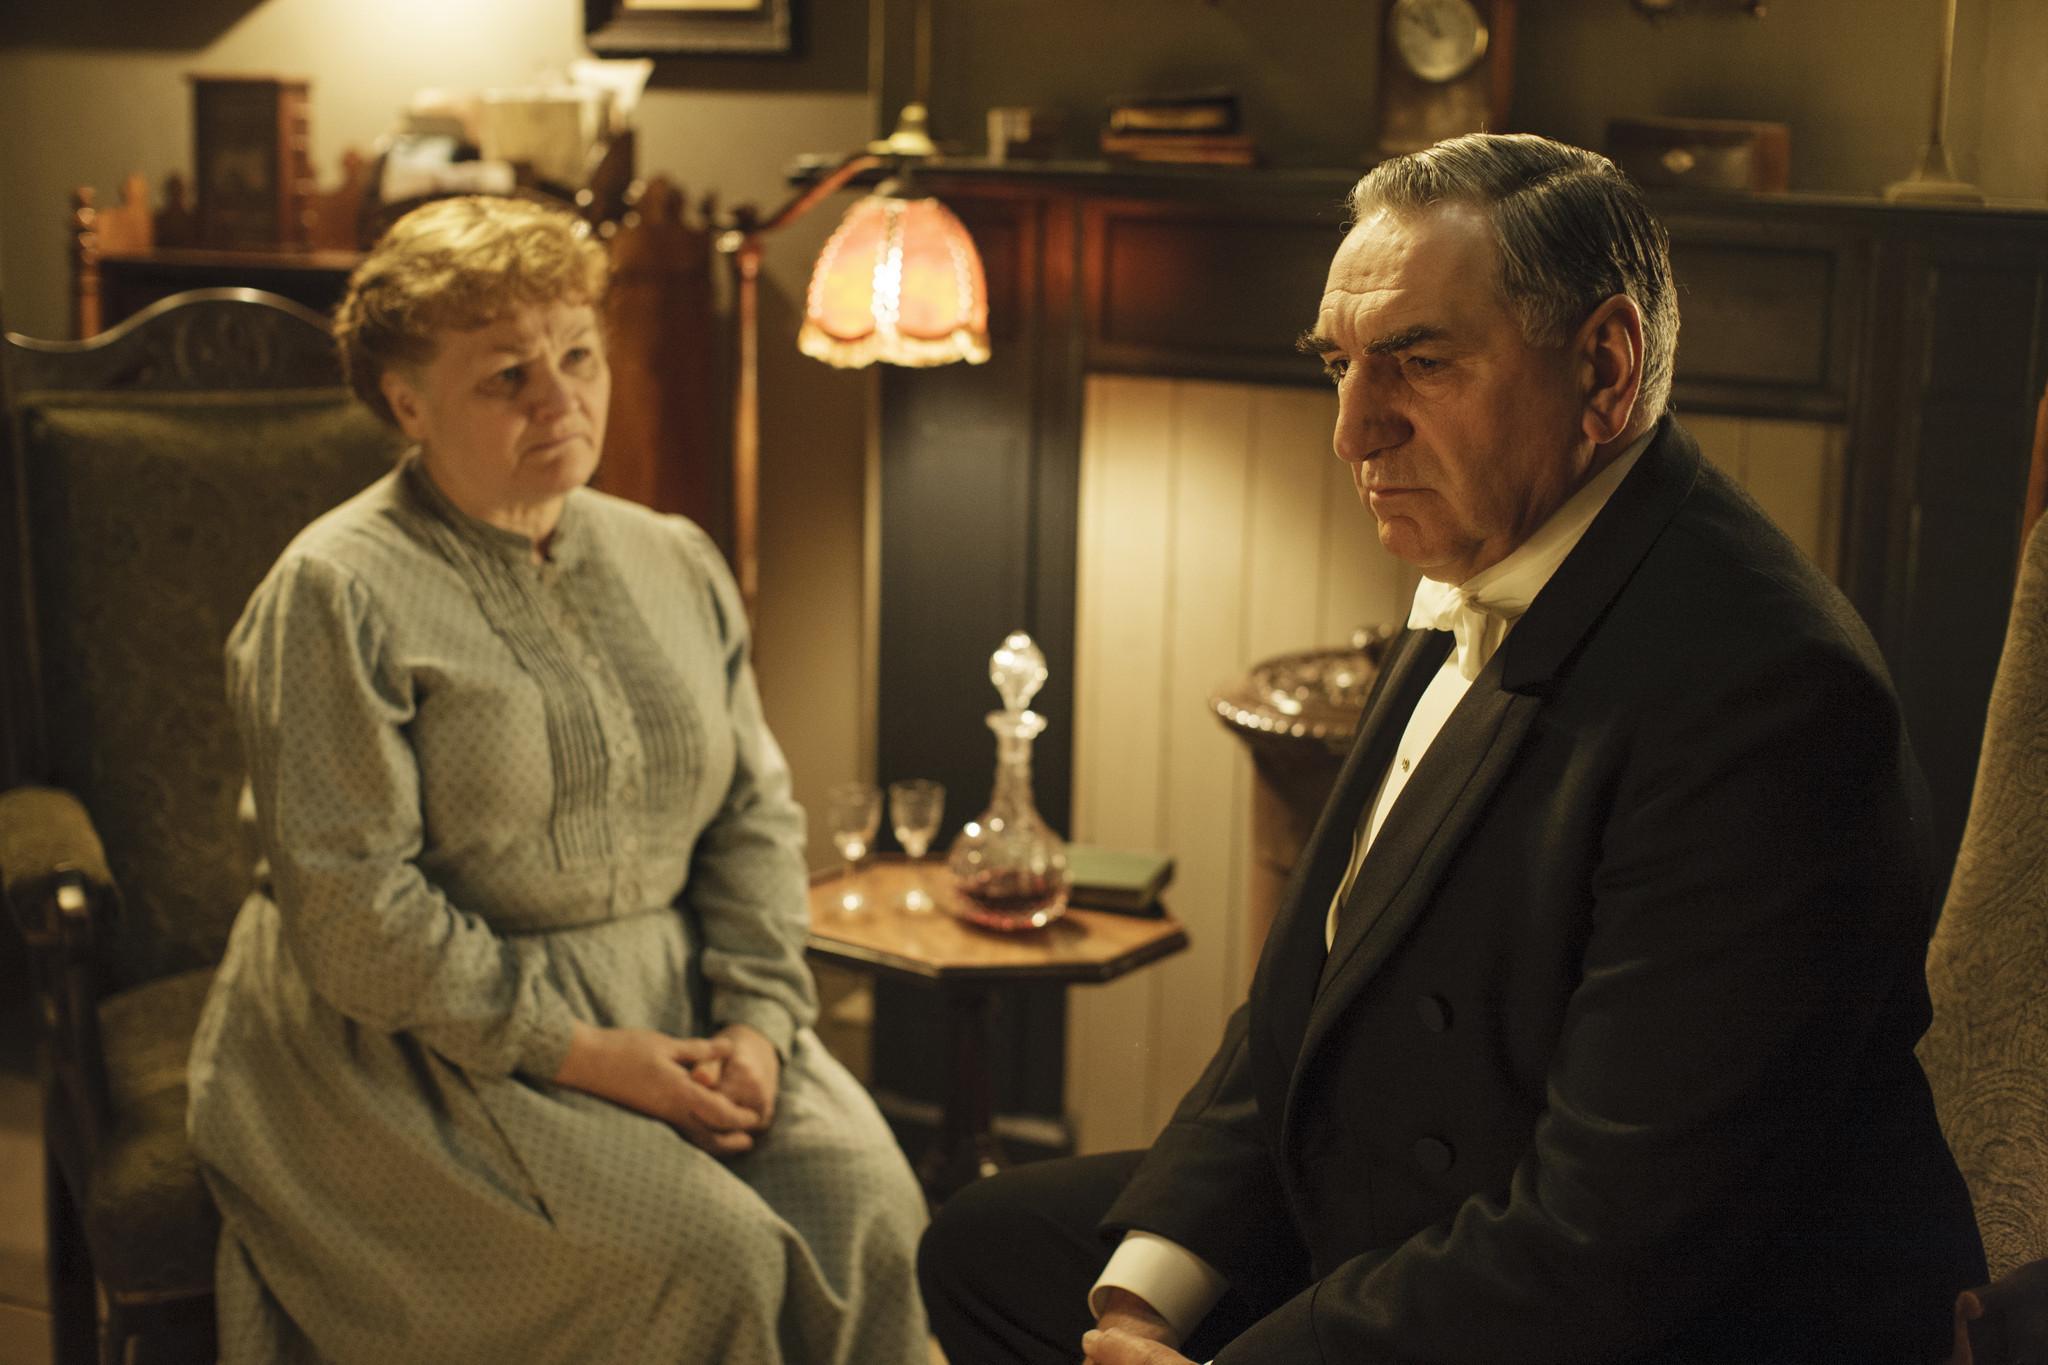 downton abbey season 6 premiere recap the future is unwritten baltimore sun - Downton Abbey Christmas Special